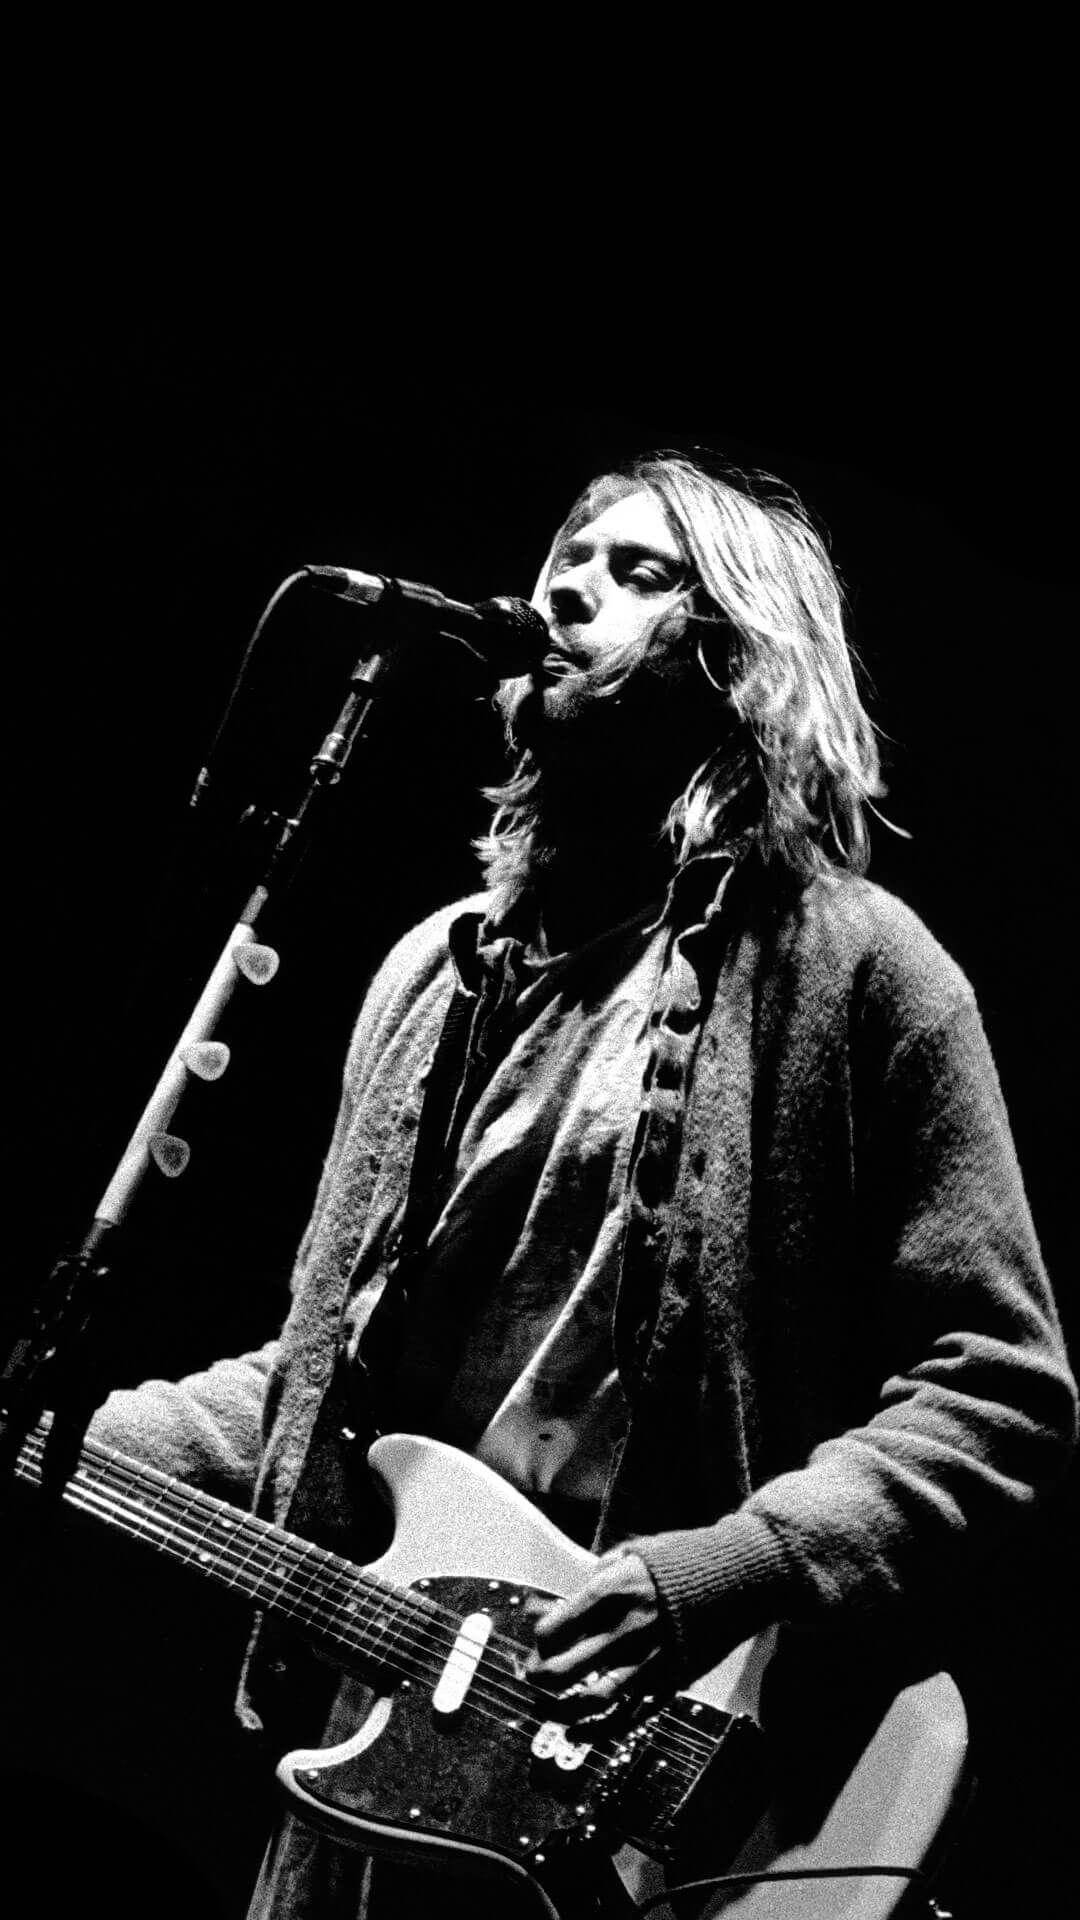 Kurt Cobain IPhone 6 Plus Wallpaper HD Rock n roll Rock mzik 1080x1920